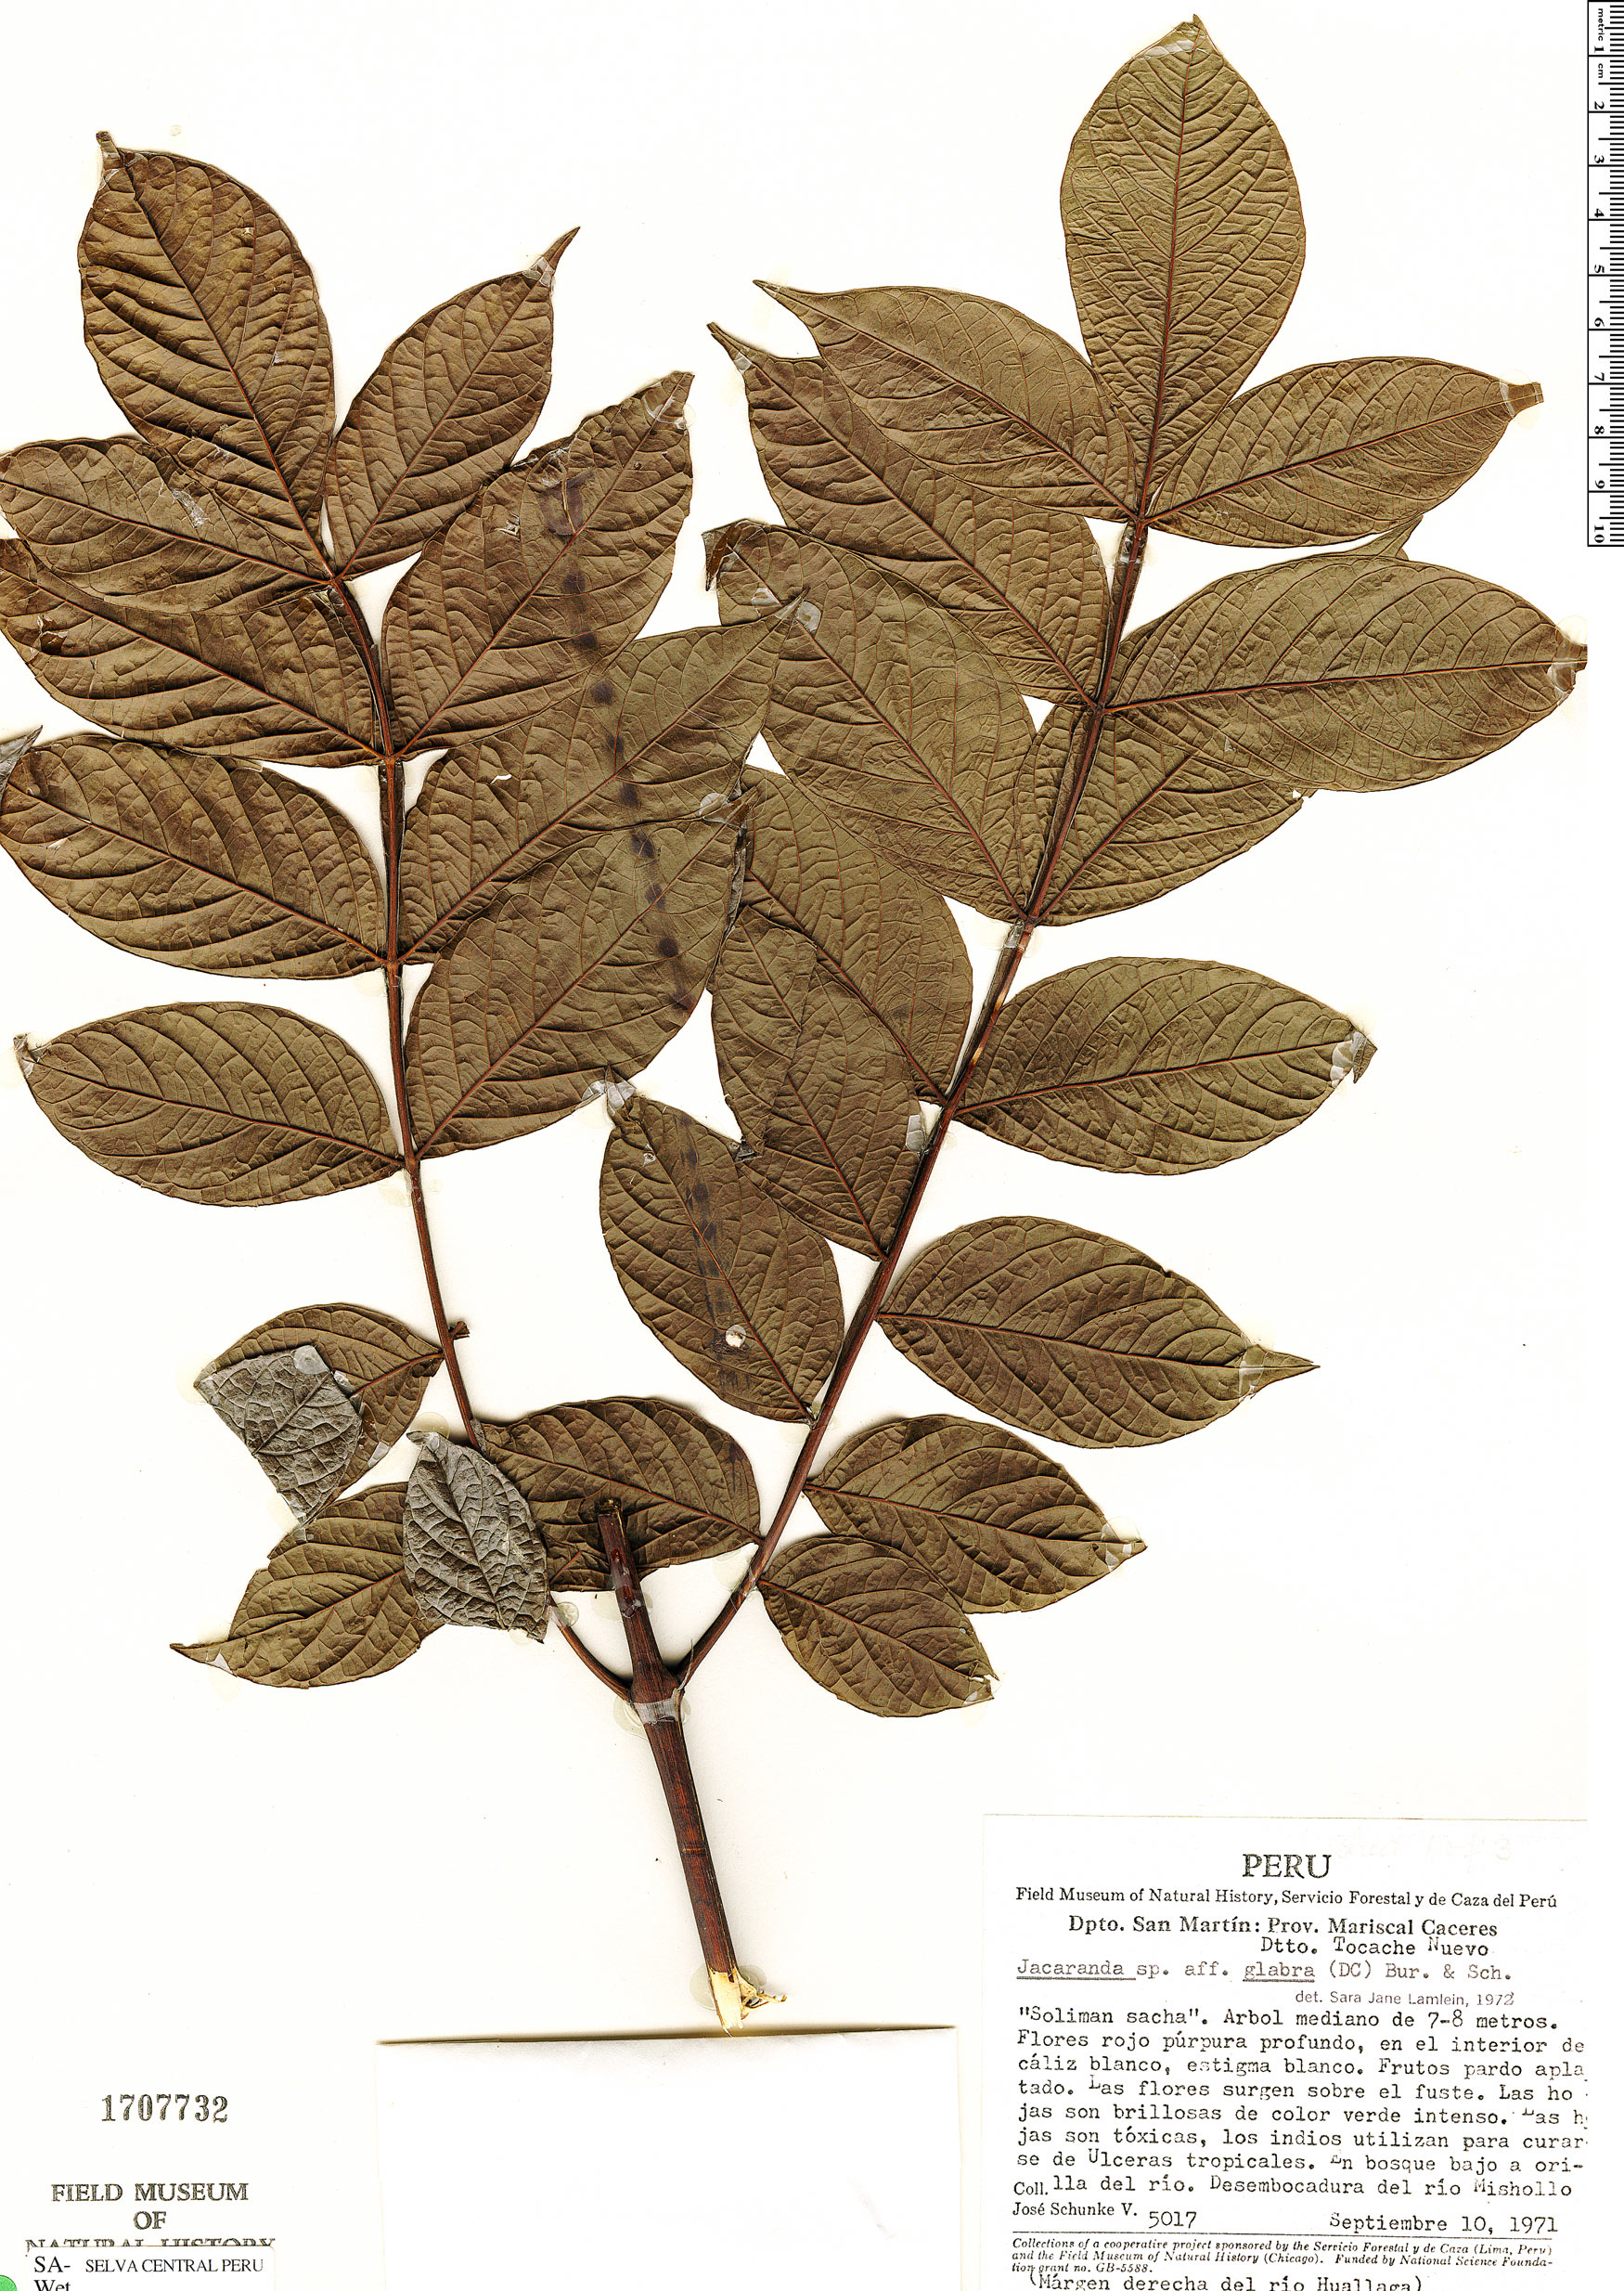 Espécime: Jacaranda glabra